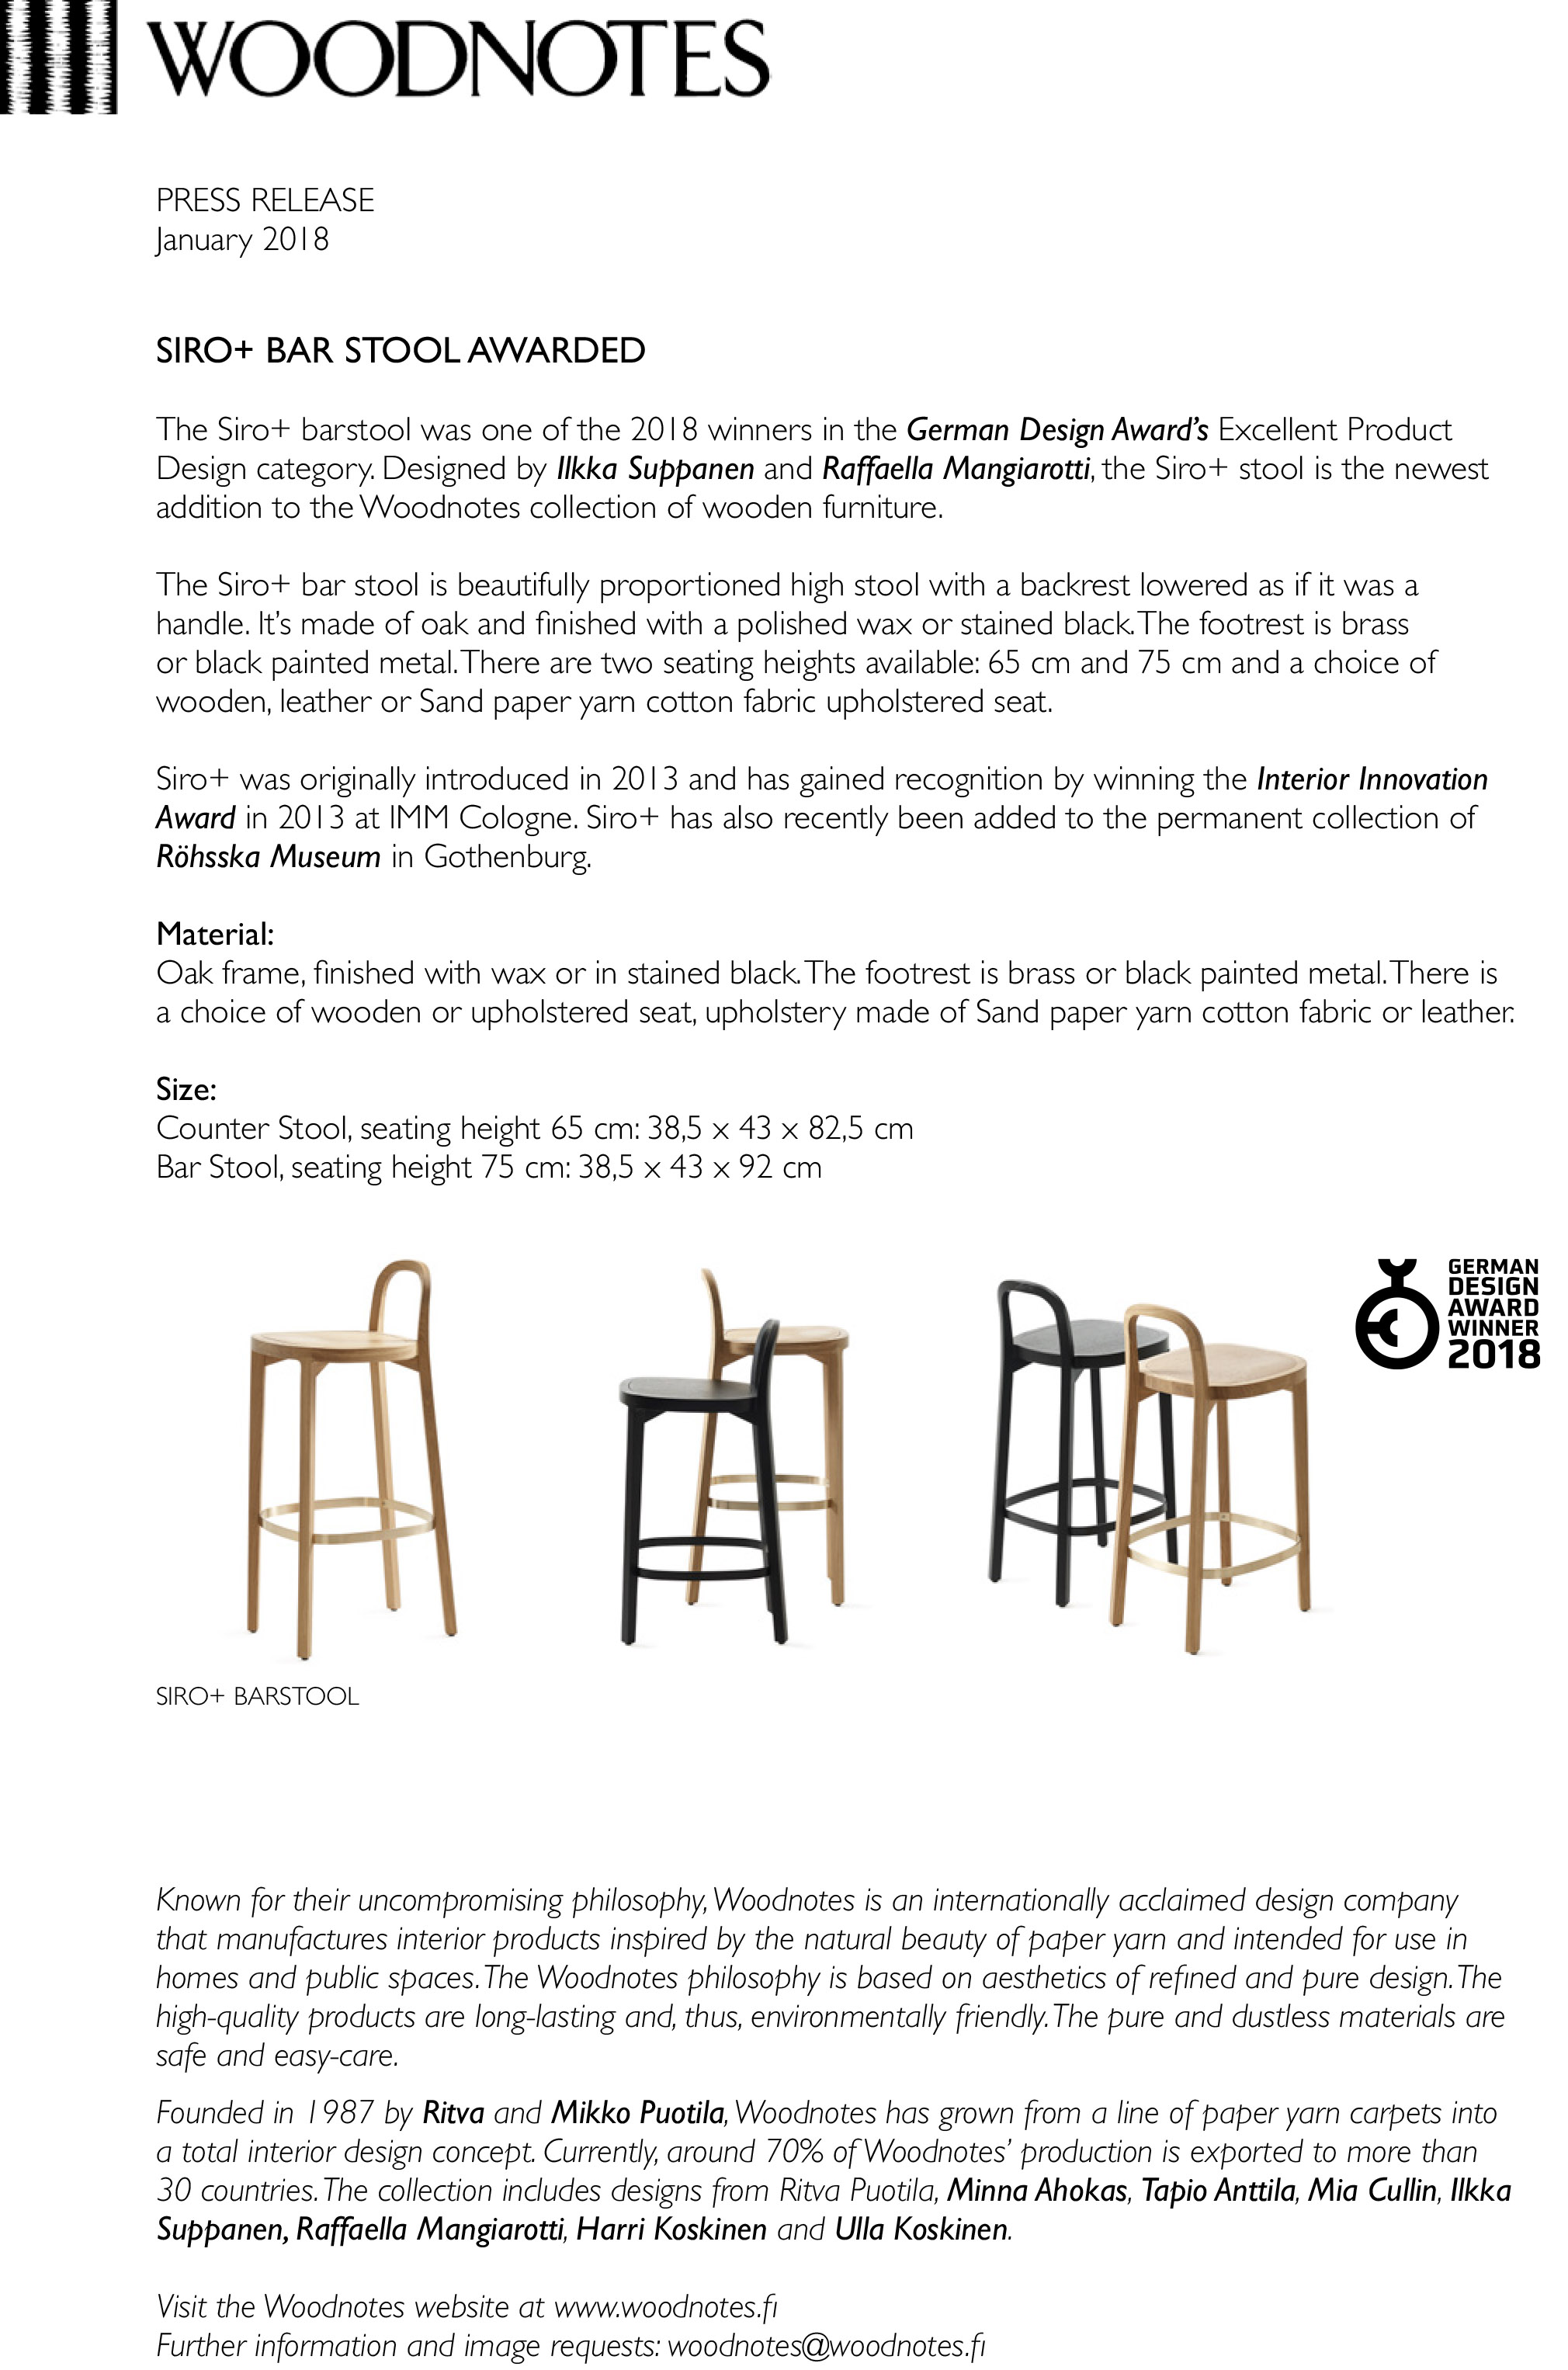 Woodnotes press release _German Design Award 2018.jpg